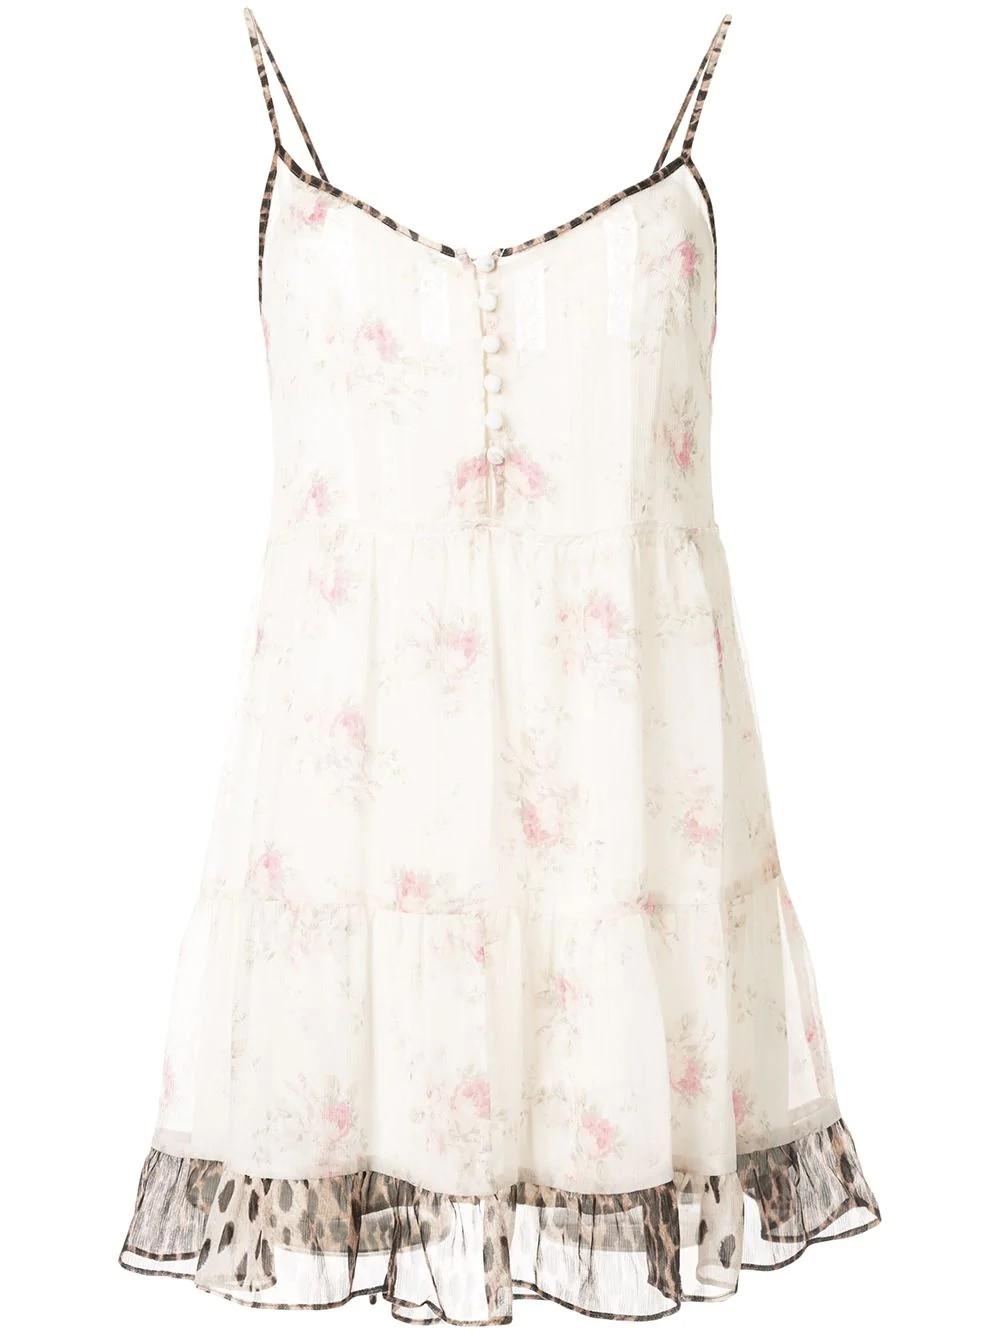 OVERLAY DRESS W